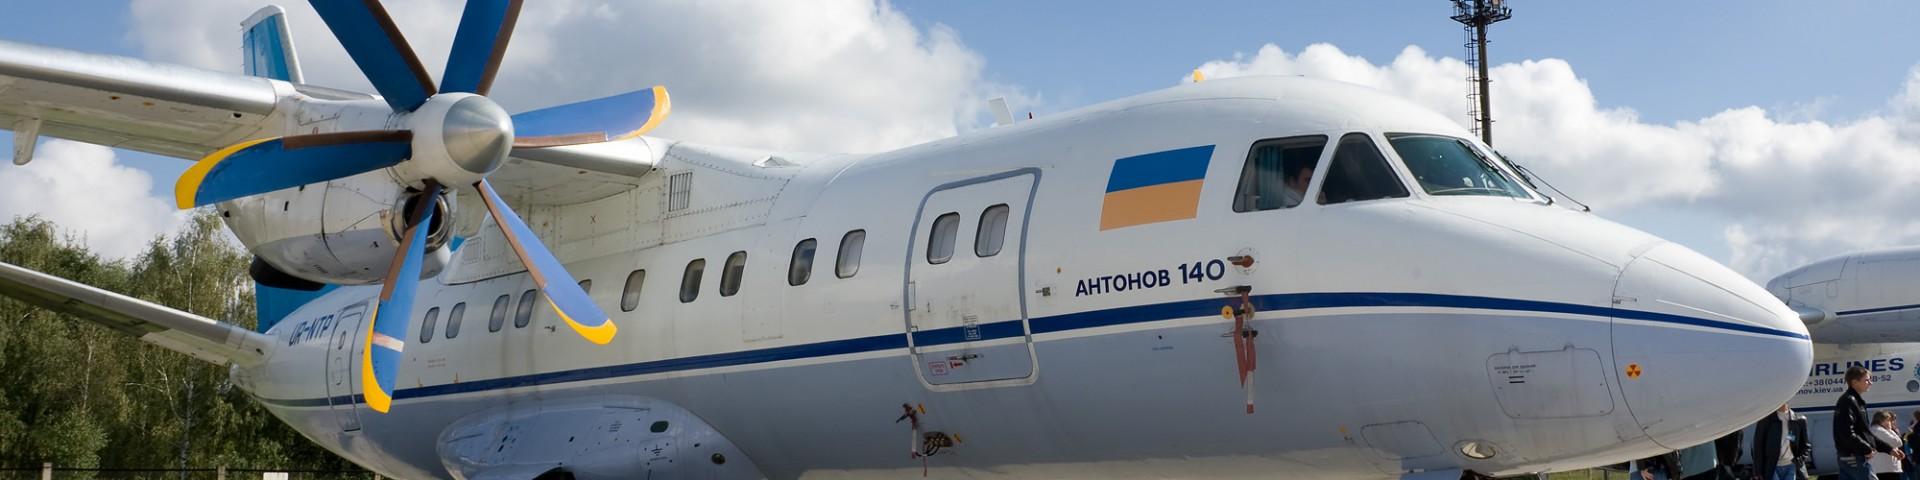 Ан-140 Украина